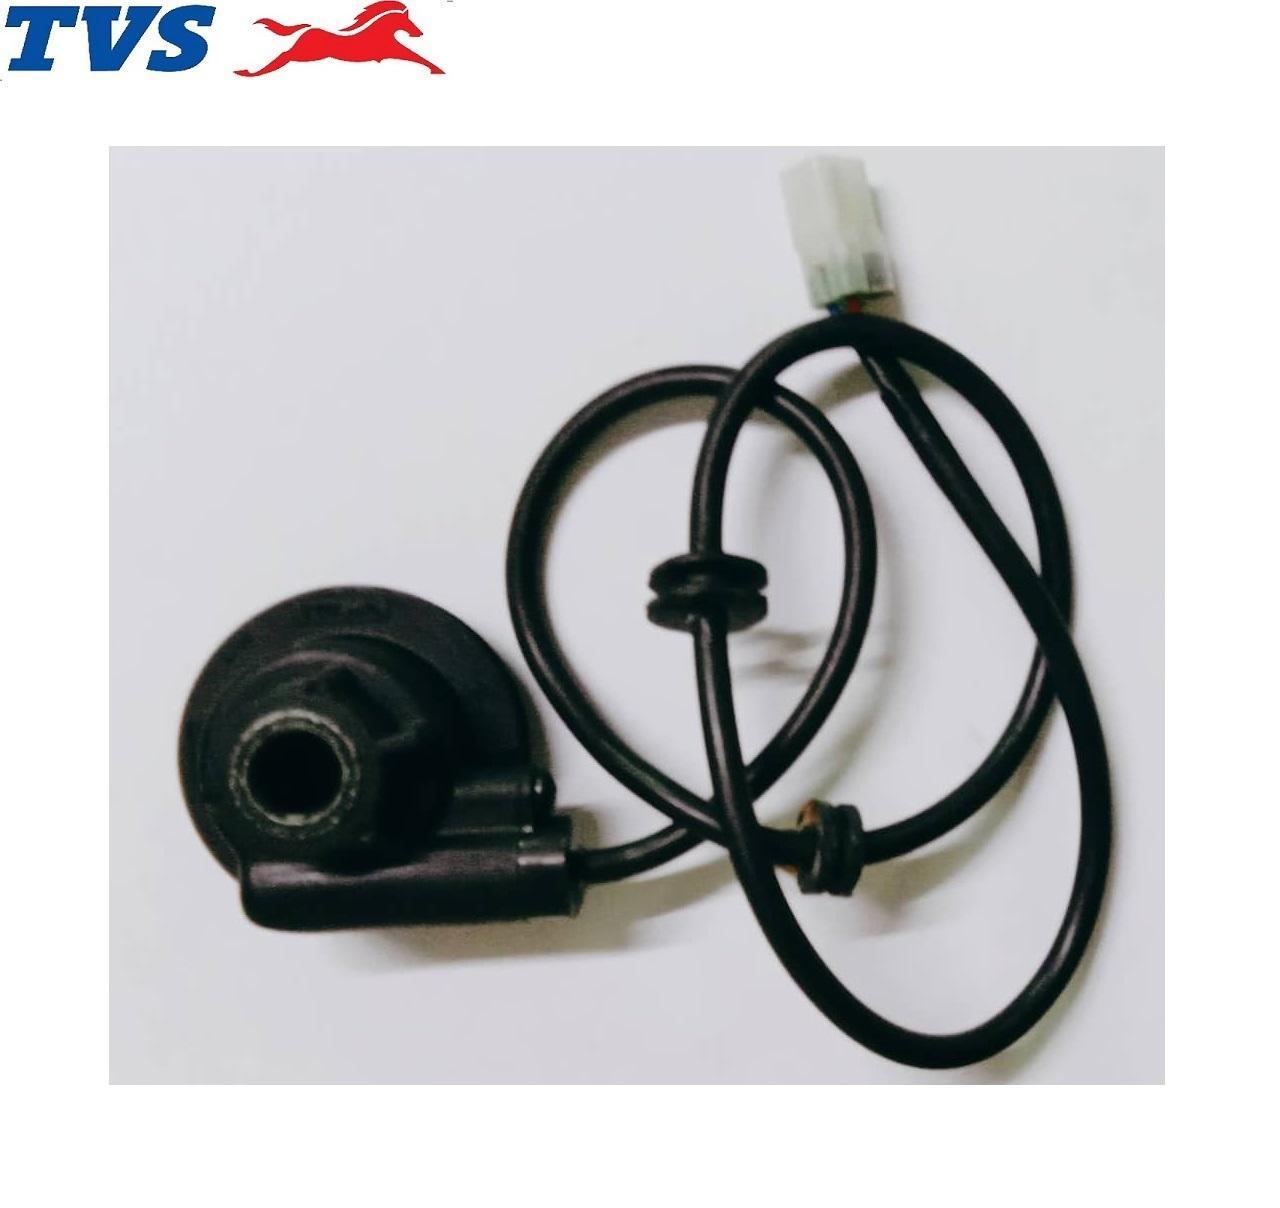 TVS APACHE 150-180 - SPEED SENSOR ( P No N9111800 )TVS Motorcycle Genuine  Parts